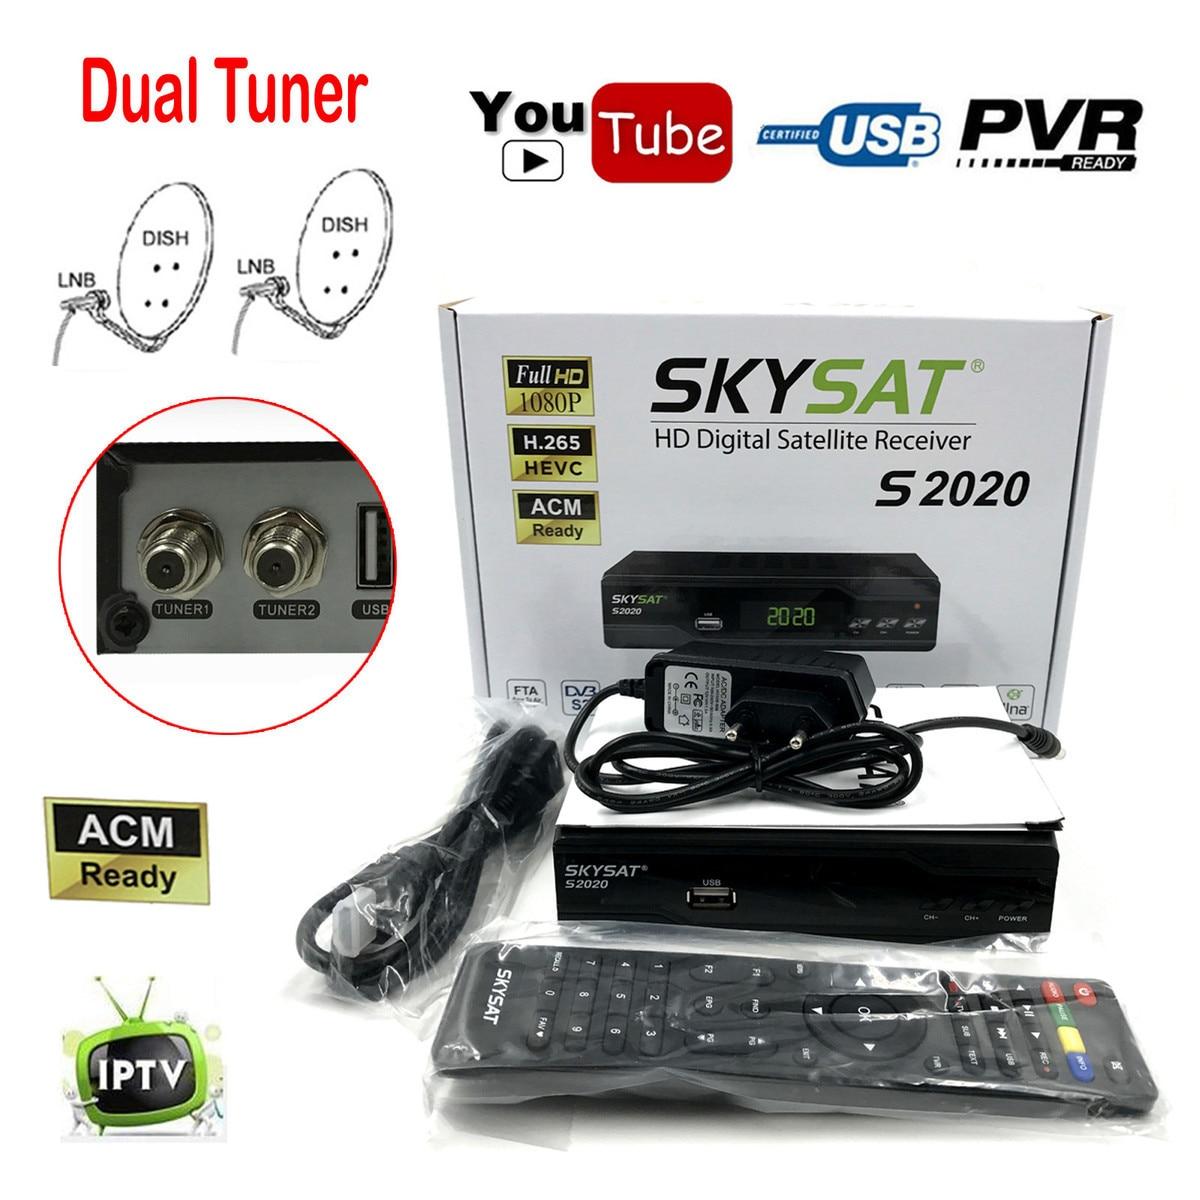 Sud America ACM Digitale Ricevitore Satellitare Twin Tuner H.265 Dish AVC Più Stabile Clines IKS SKS VCM/CCM IPTV con LAN Wifi